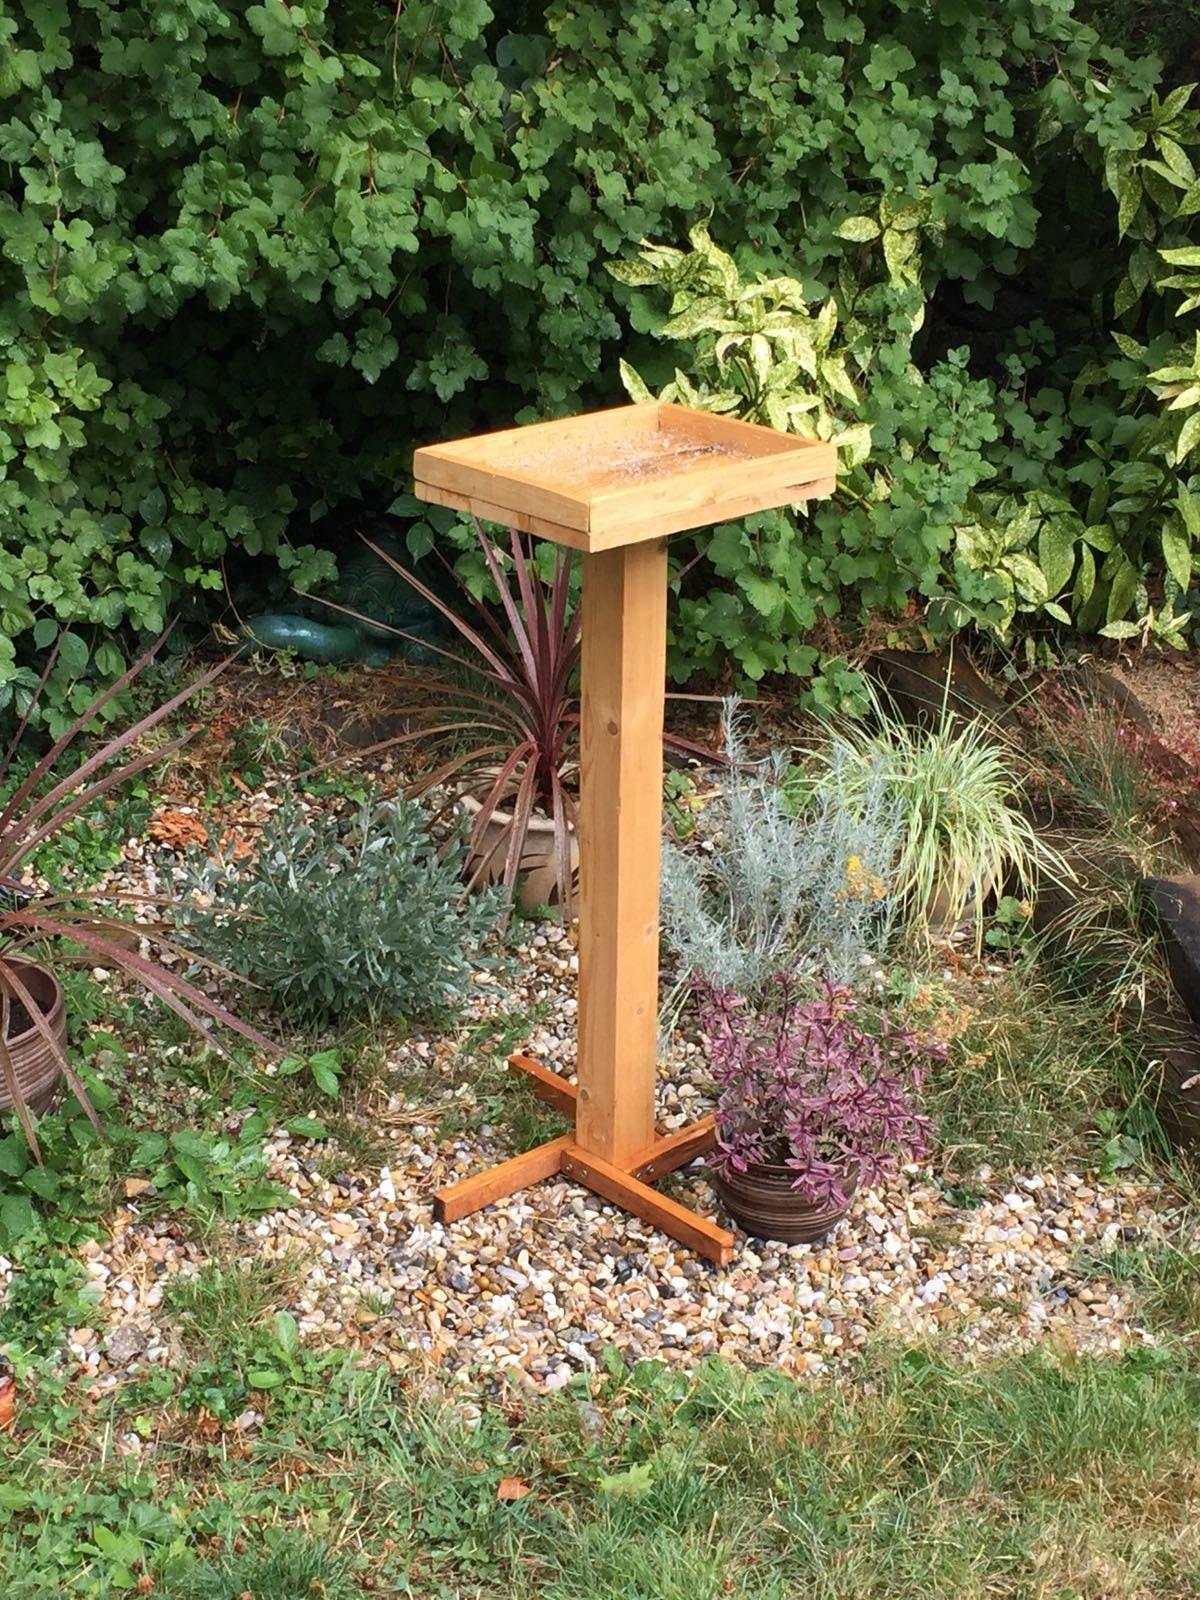 Bird Table Wooden Bird Table Garden Bird Table Standing Bird Table Rustic Bird Table Garden Feeder Bird Feeder Wooden Bird Table